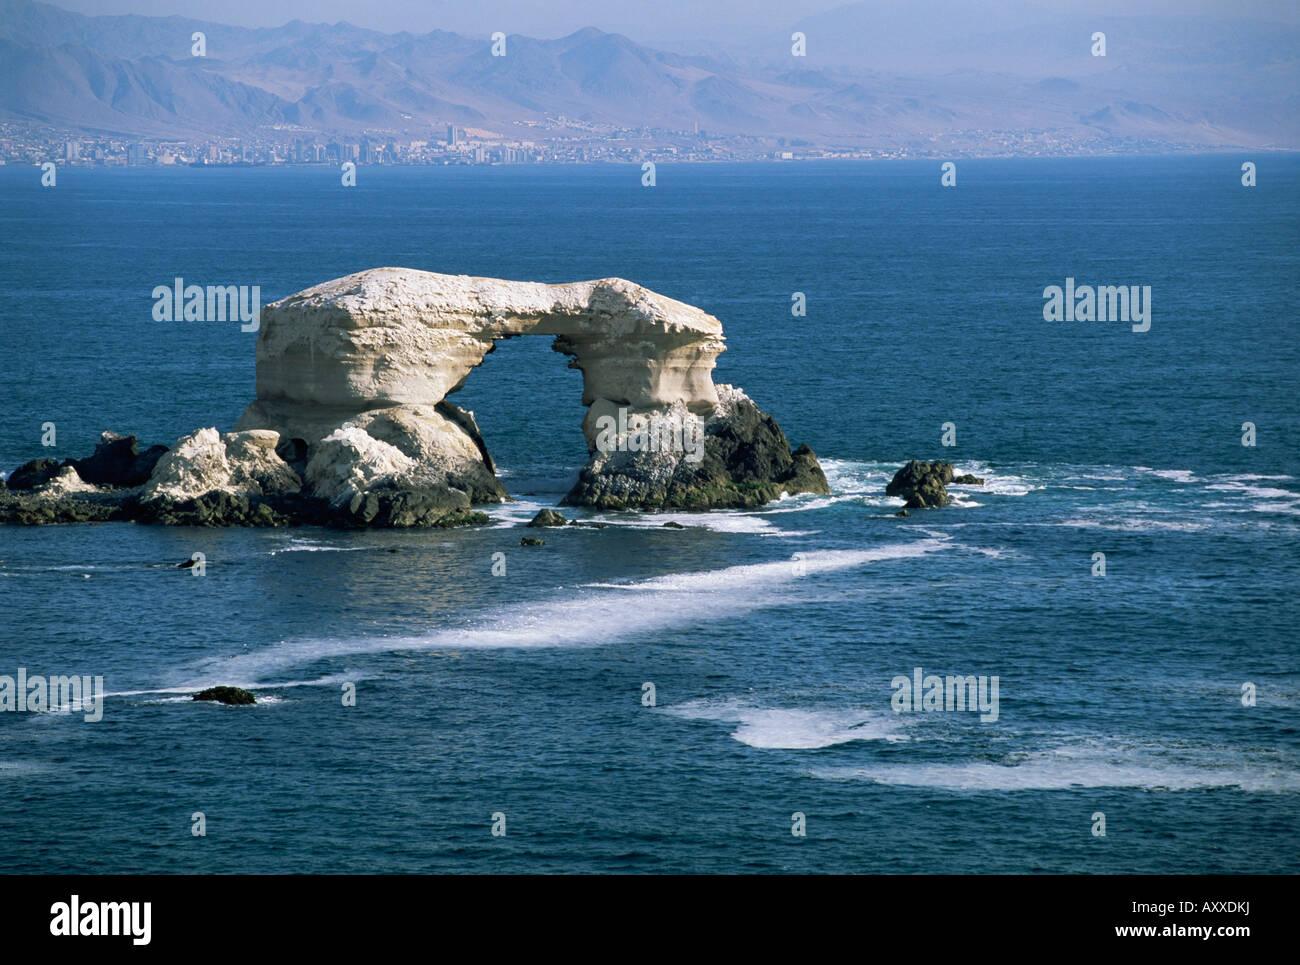 La Portada natural wonder, Antofogasta, Chile, South America - Stock Image